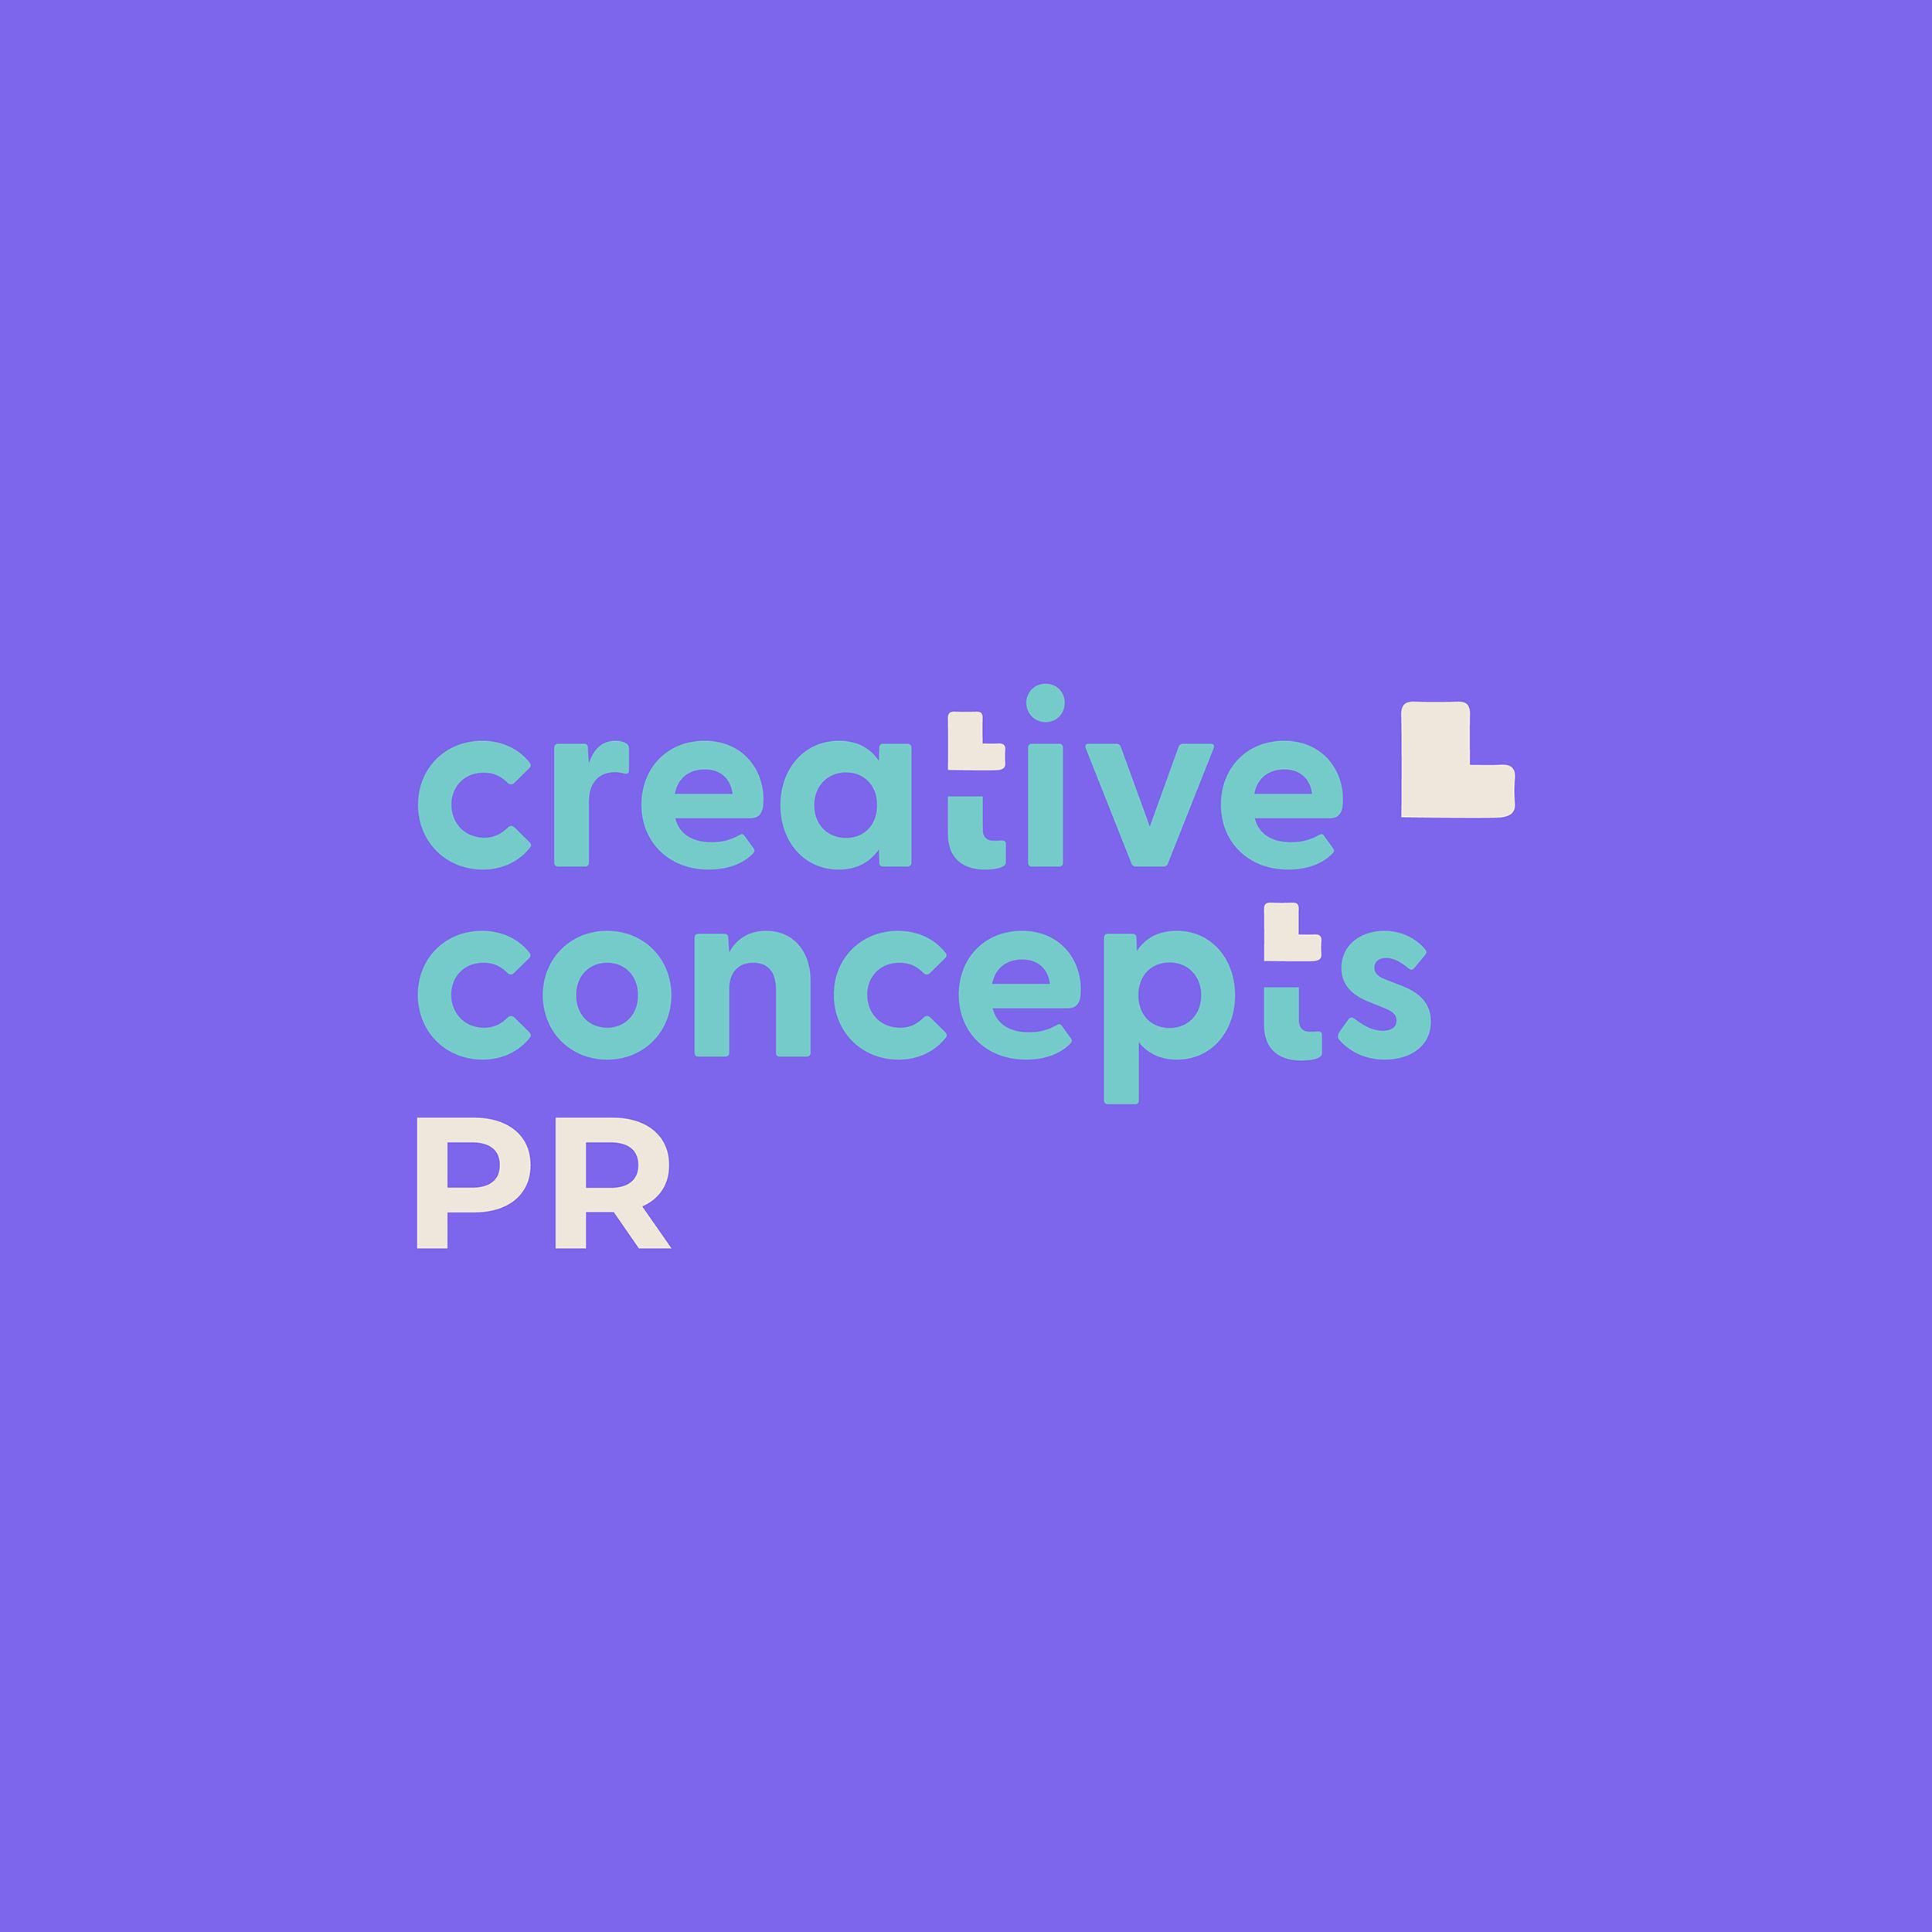 Creative Concepts Portfolio